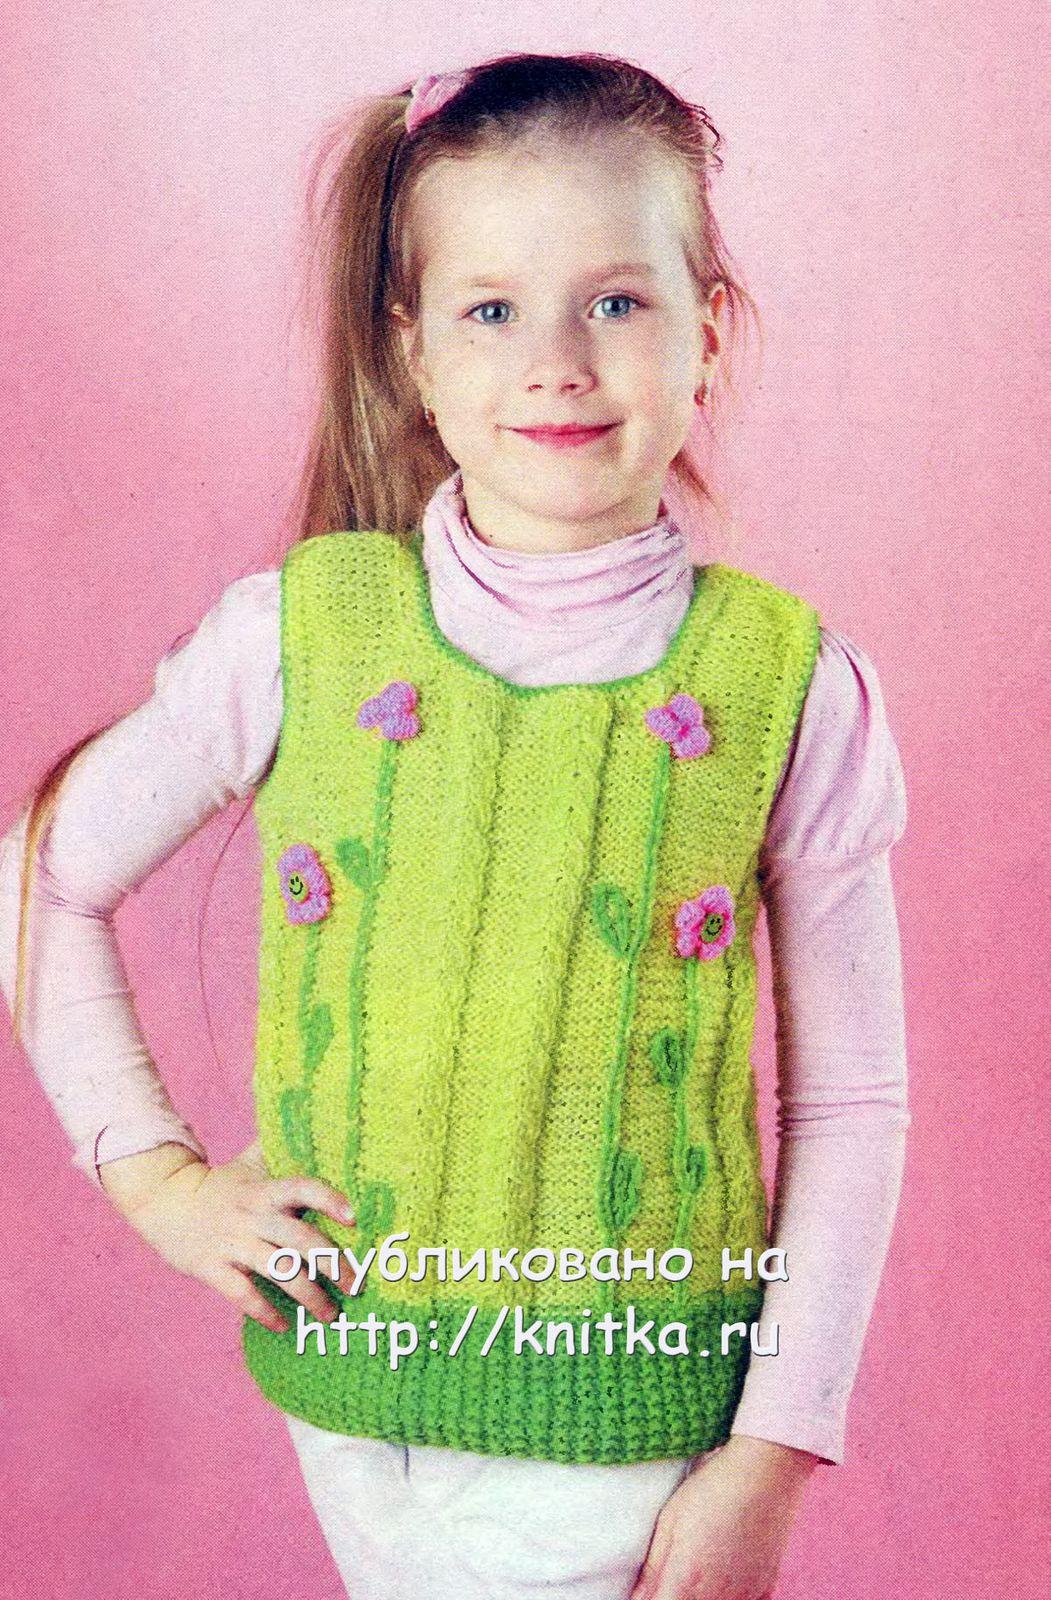 Вяжем безрукавку для девочки 10 лет спицами